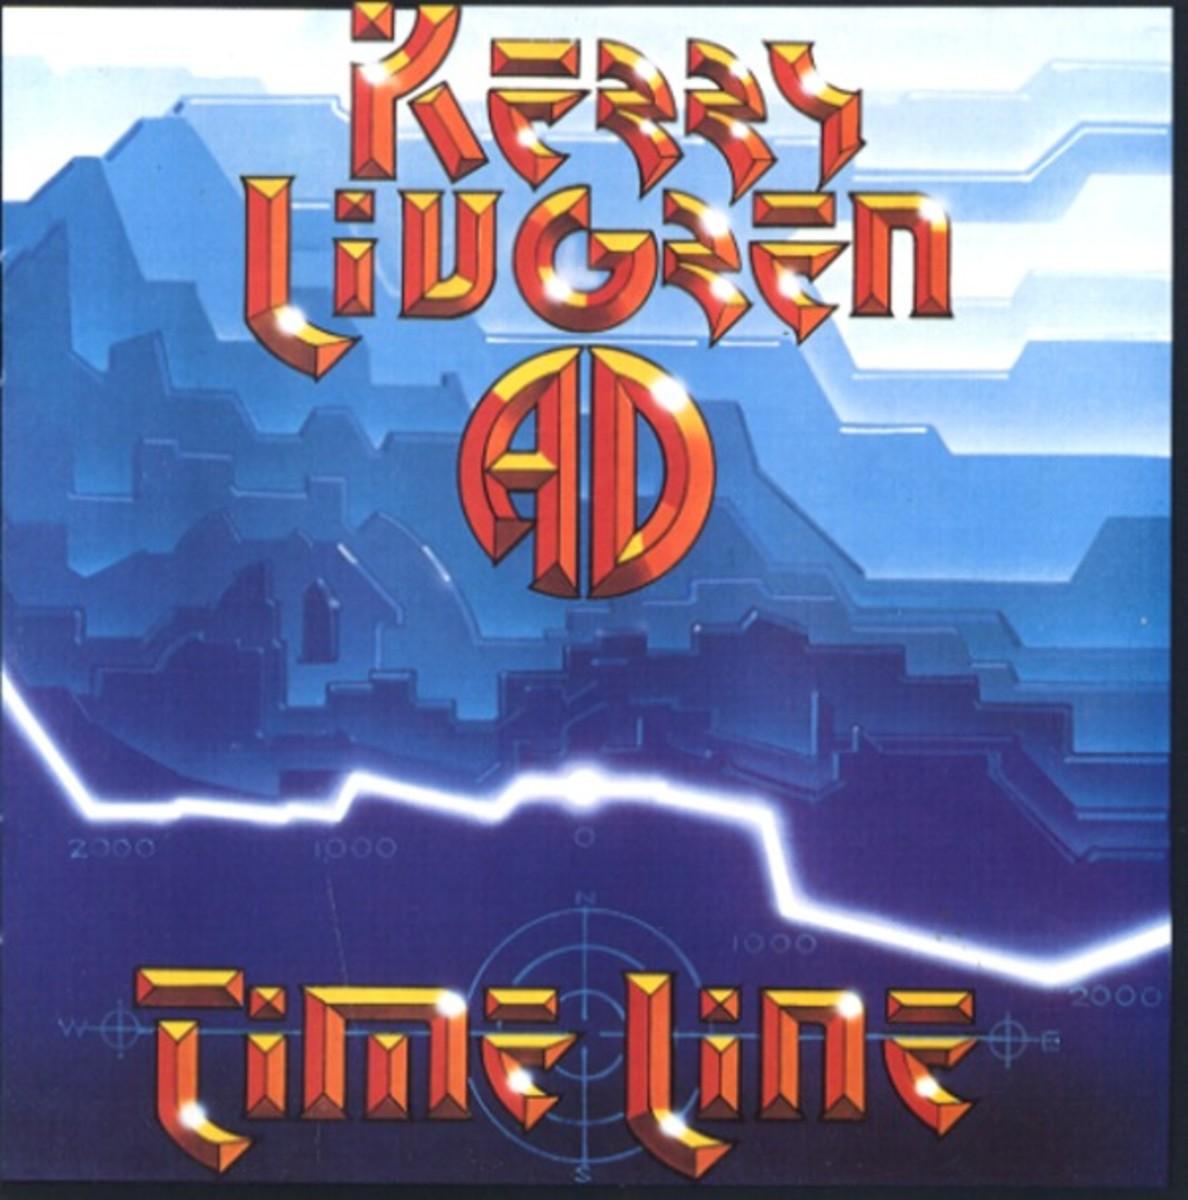 "Kerry Livgren ""Time Line"" Myrrh Records MYR R 1205 12' LP Vinyl Record, UK Pressing (1984) Album Cover Art by Rick Griffin"